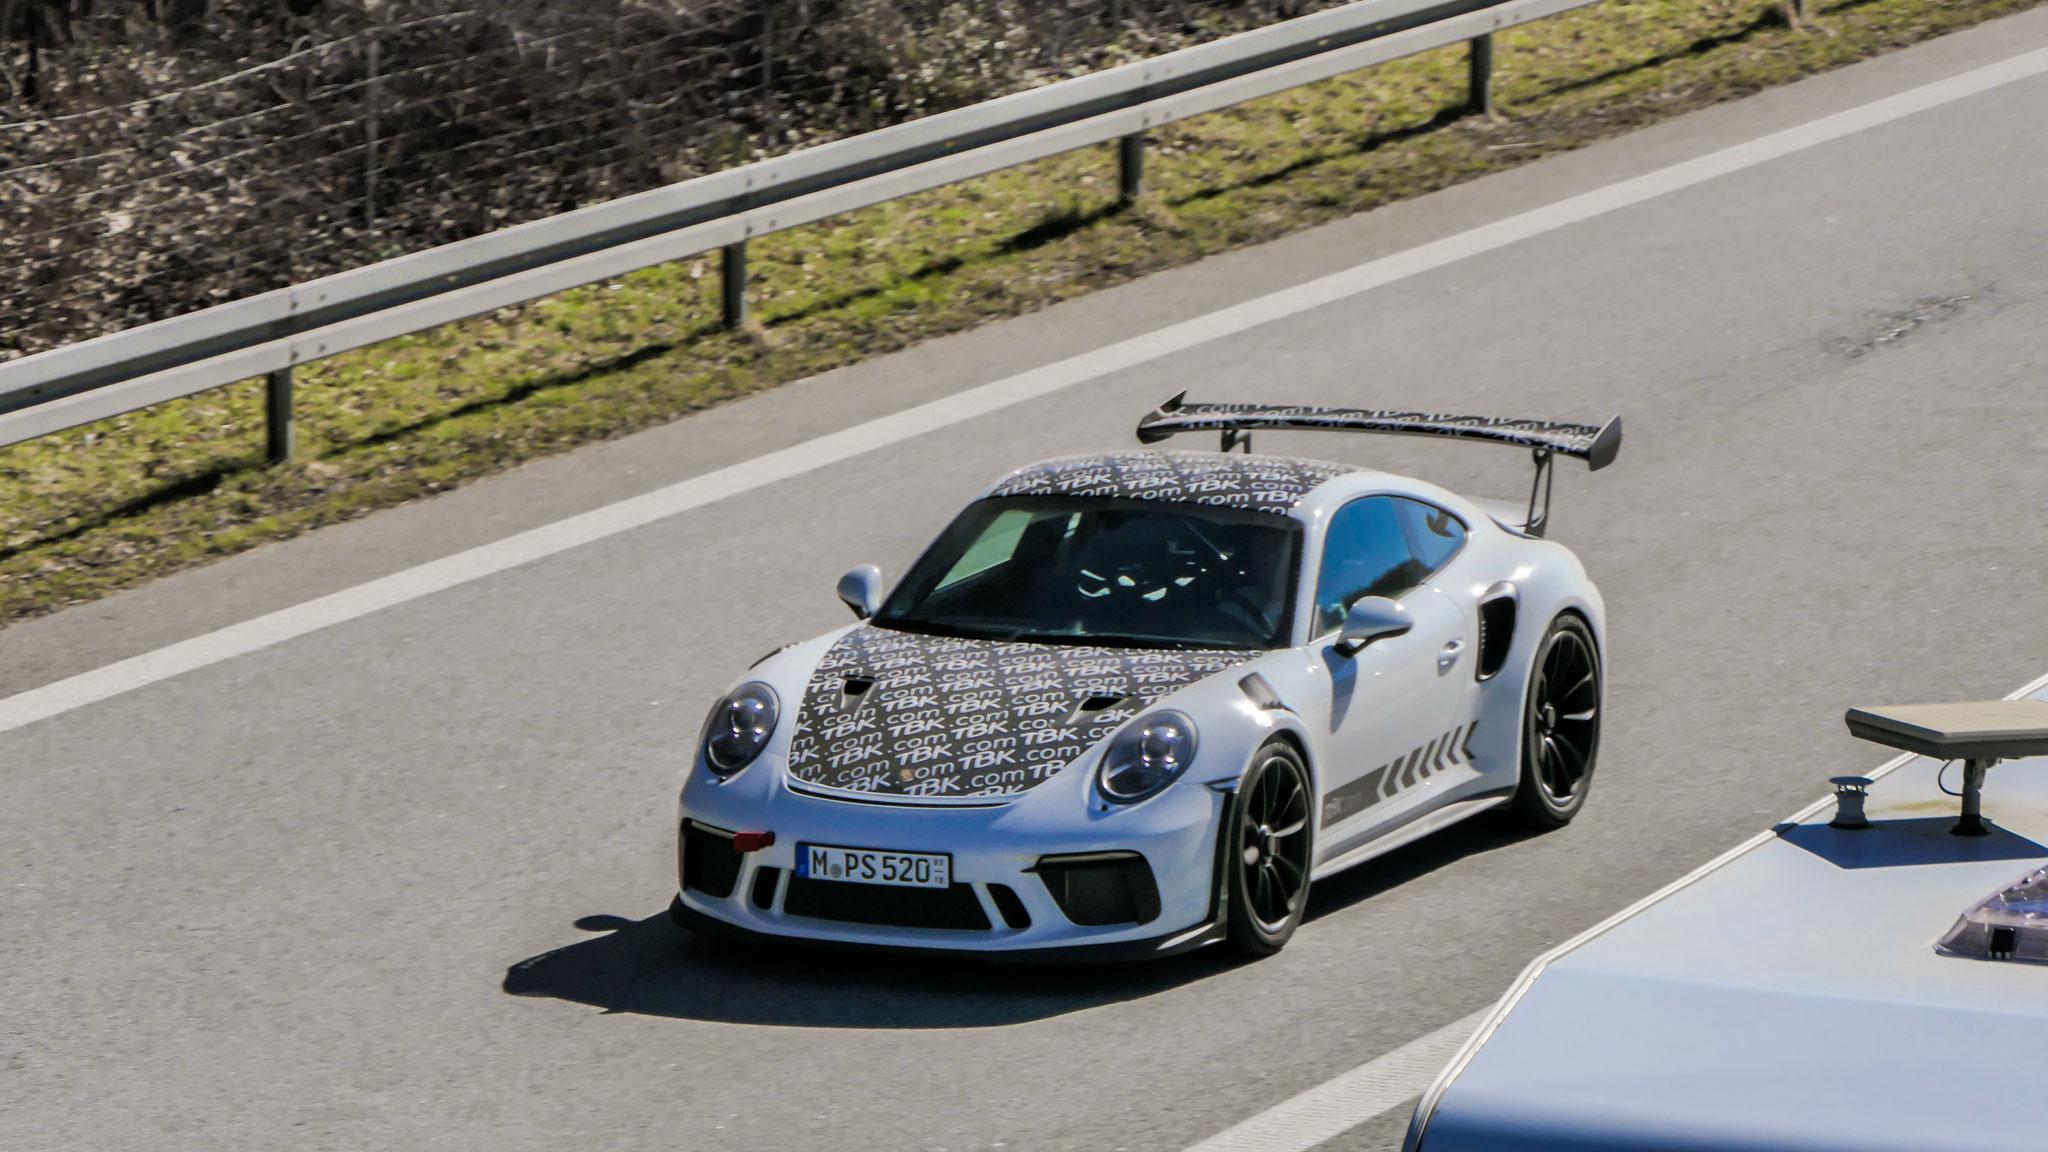 Porsche 911 991.2 GT3 RS - M-PS-520